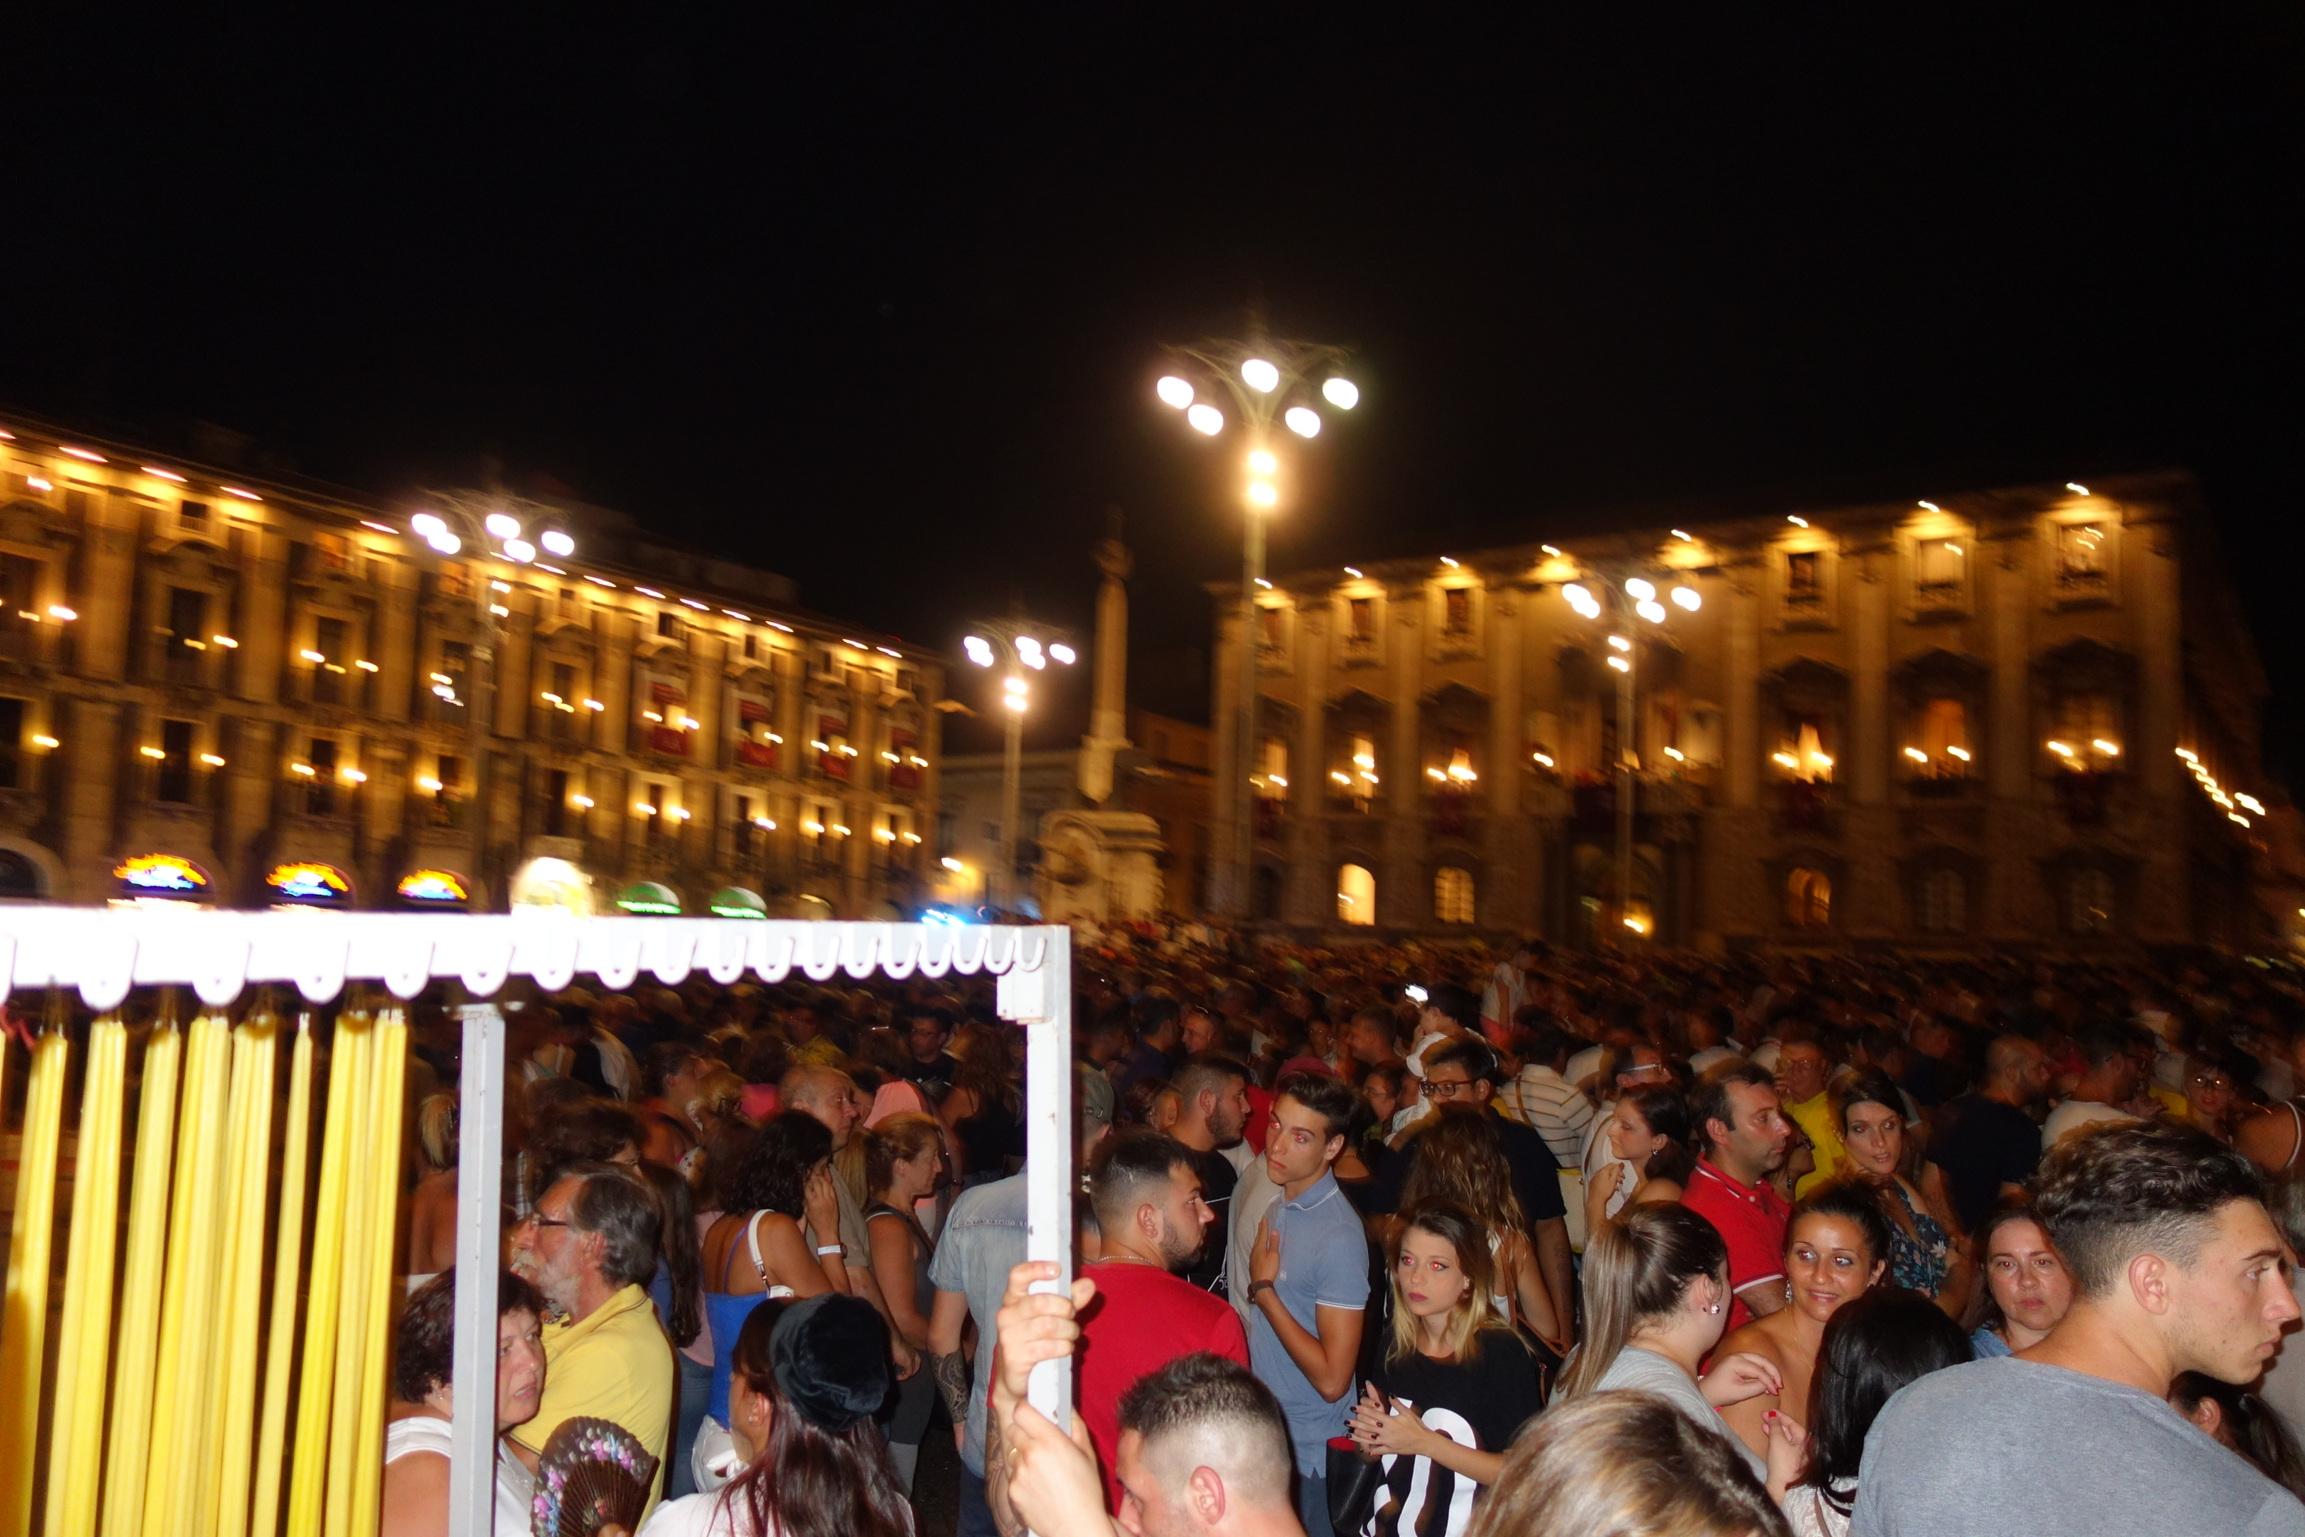 Catania at night